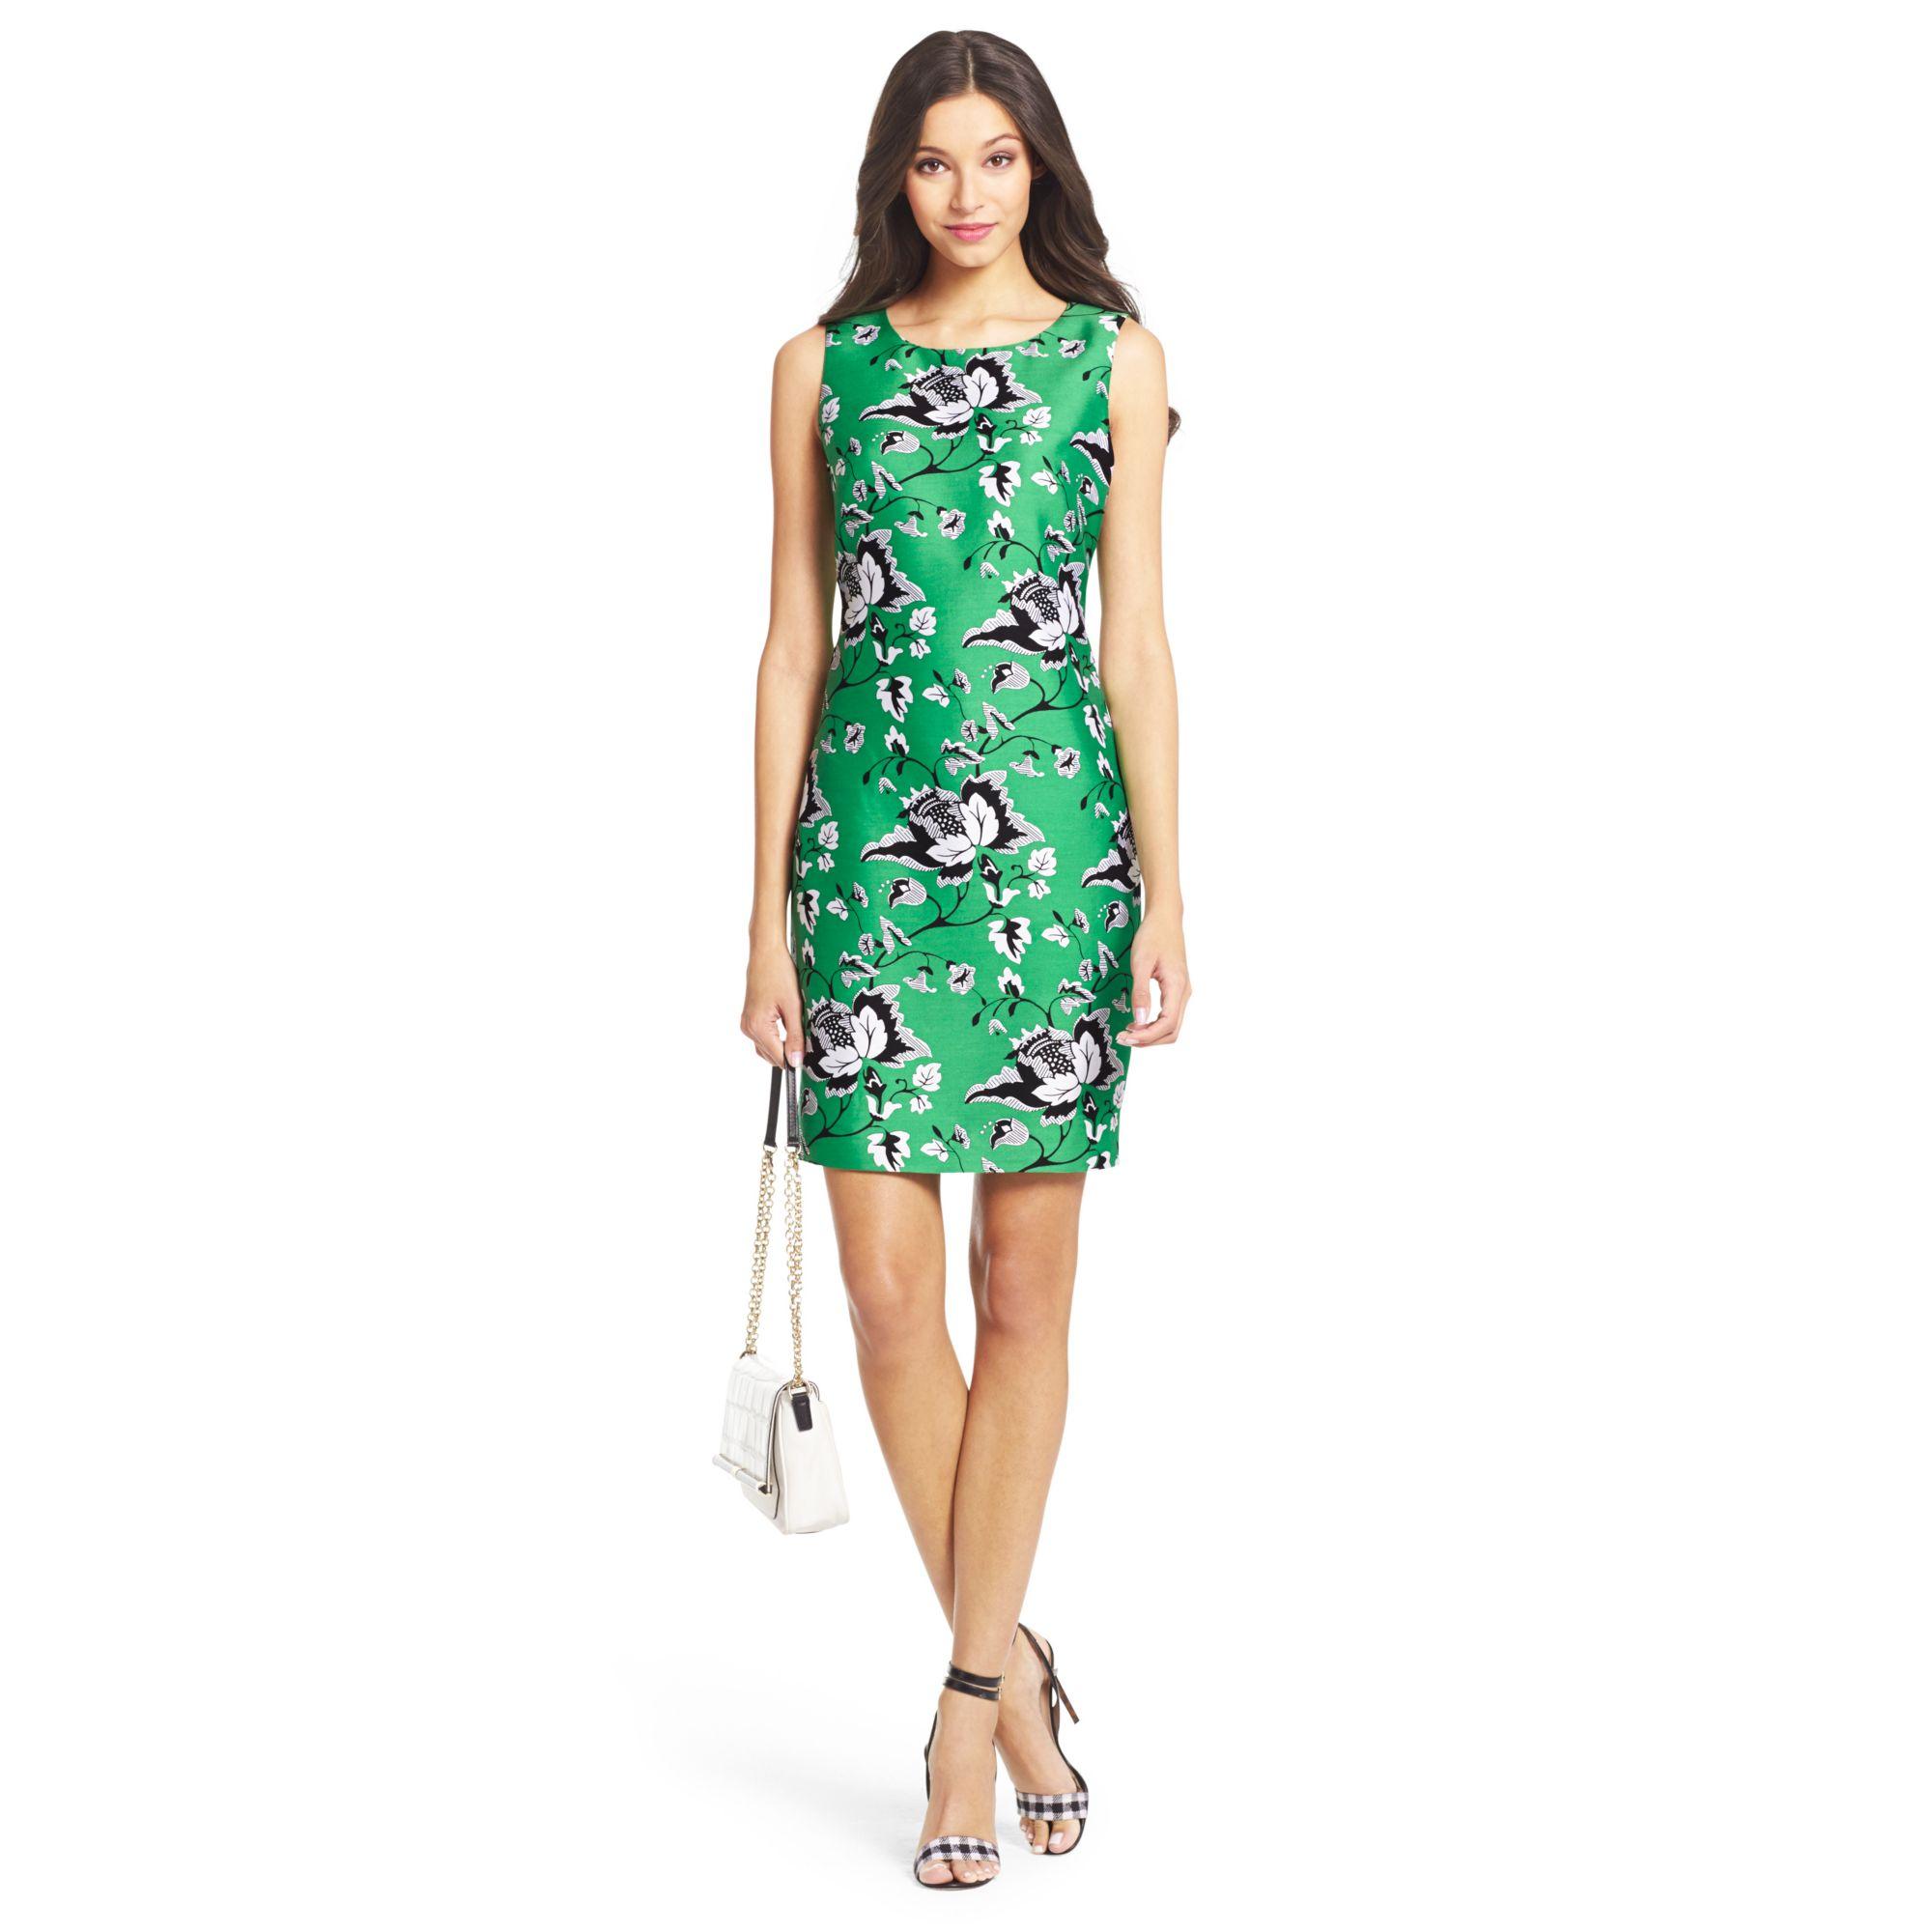 d41029880b2f4 Diane von Furstenberg Dvf Sofia Silk Wool Shift Dress in Green - Lyst